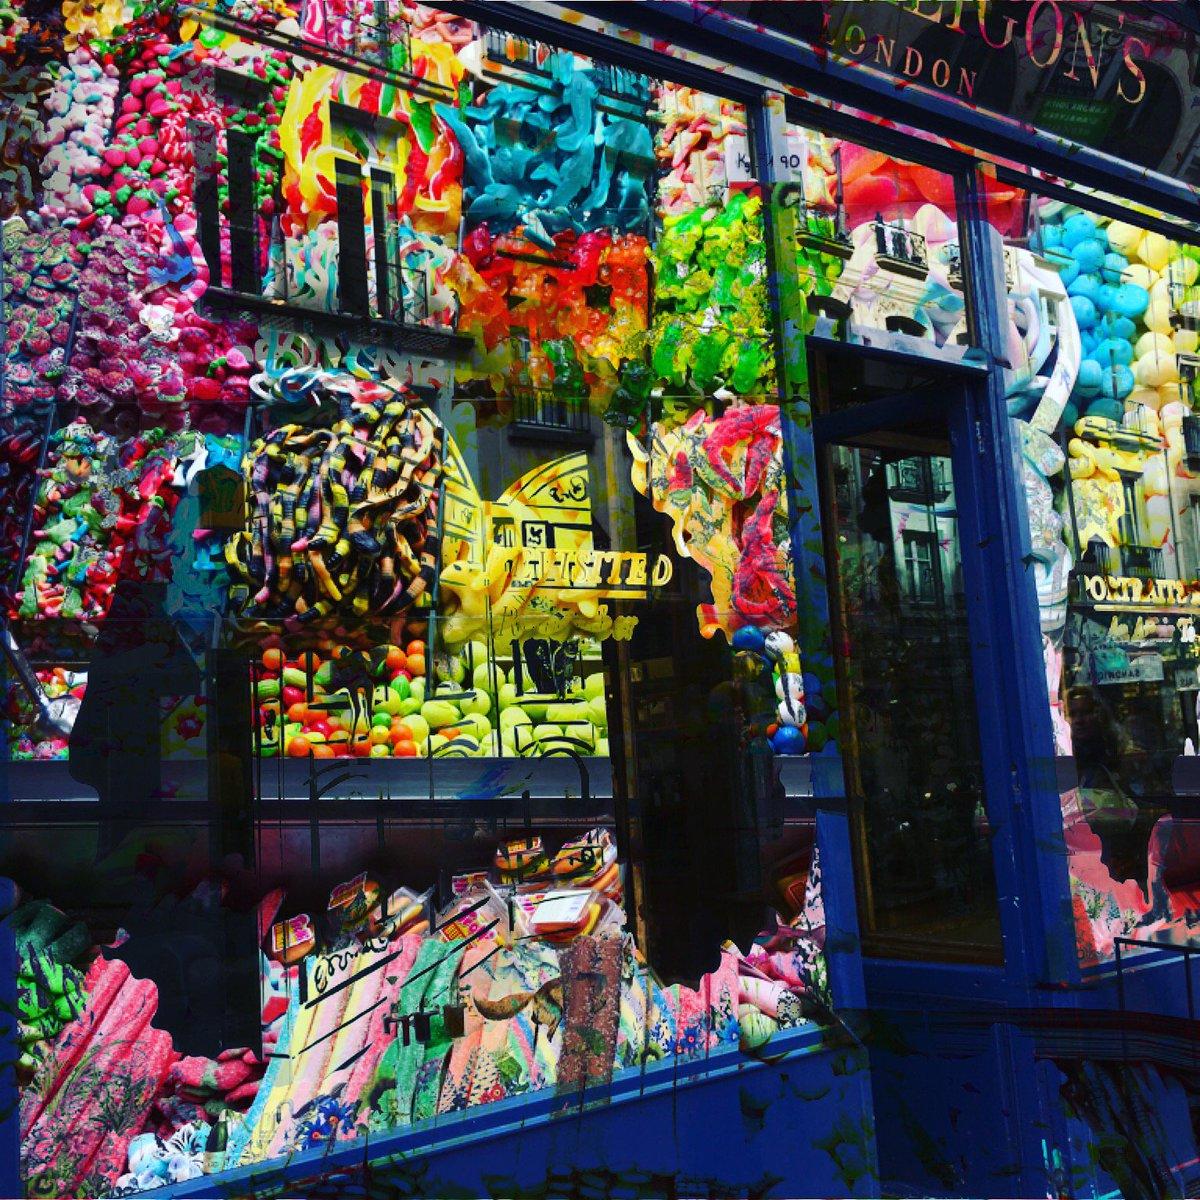 Gummi Candy House    The new collection of Creative Photo #16 by #hanamizukibcn #barcelona #paris #mixedmediaart #conceptualart #gummi<br>http://pic.twitter.com/VDX6mYL5Mu